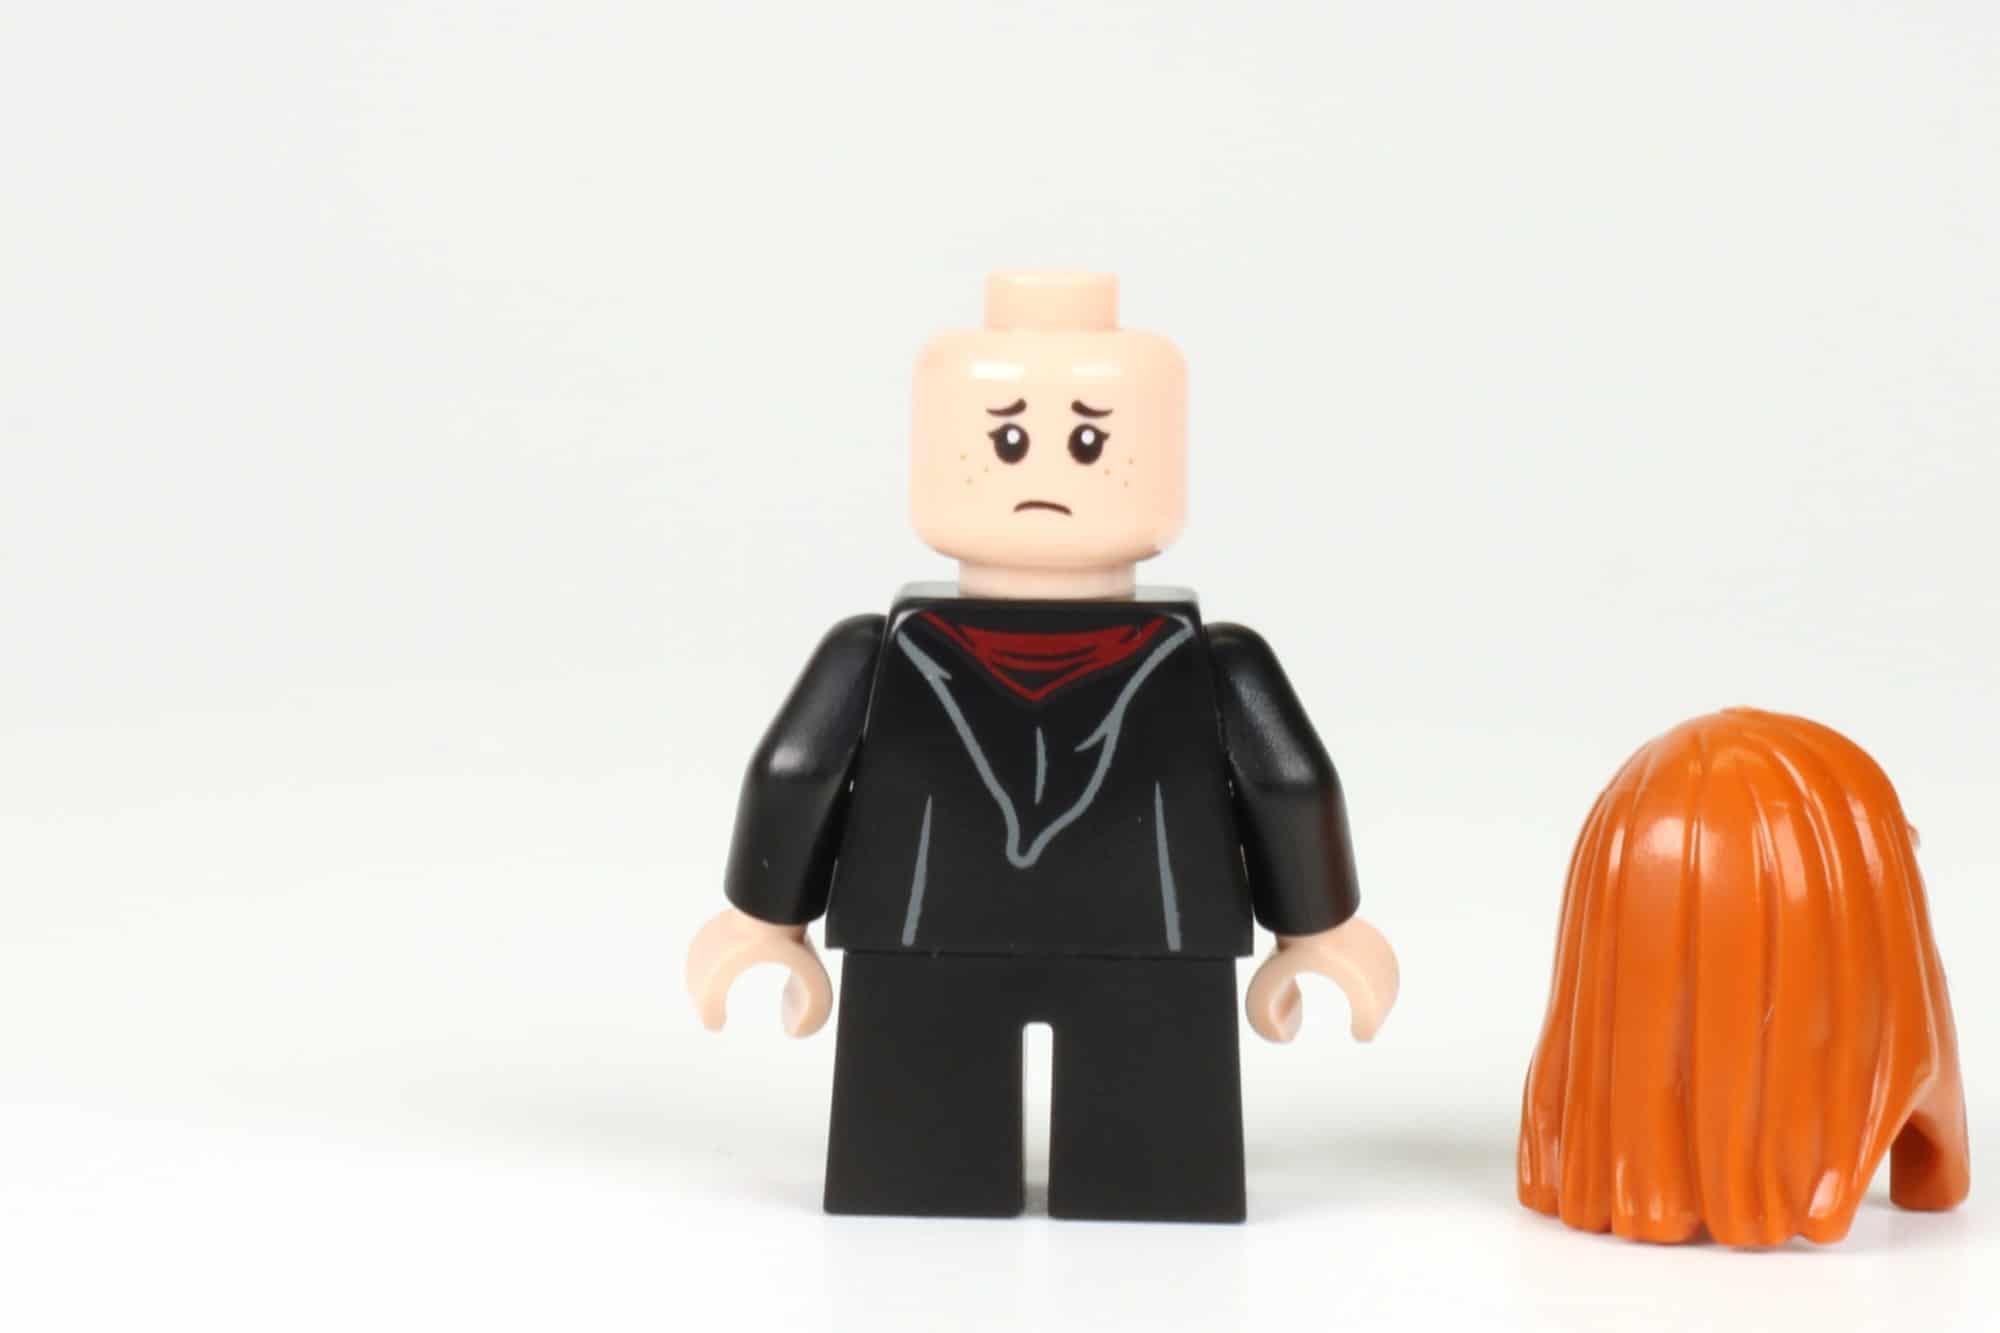 LEGO Harry Potter 76389 Hogwarts Kammer Des Schreckens Minifiguren 8 2